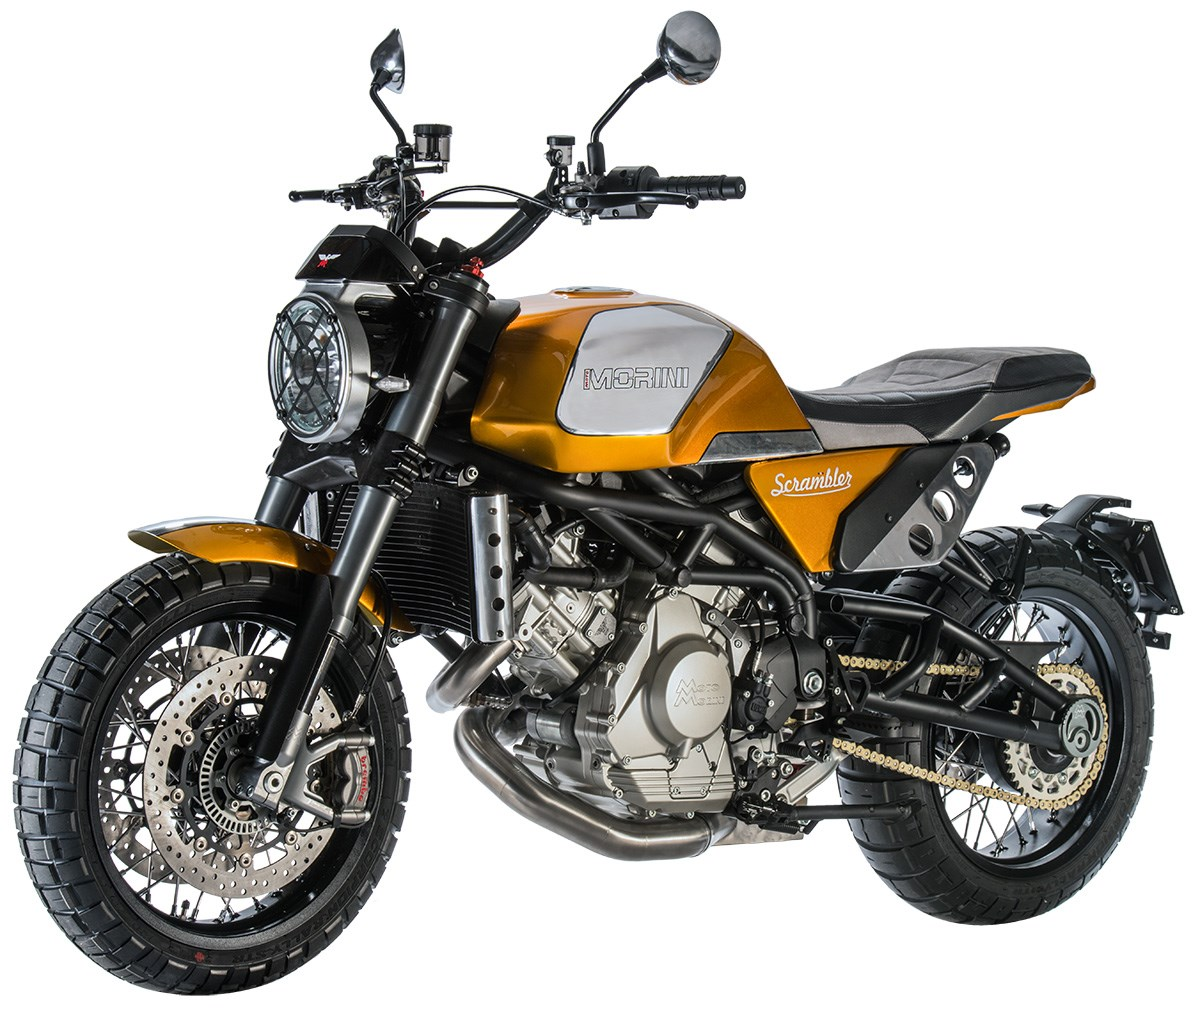 moto morini debuts new milano and scrambler motorcycle news editorials. Black Bedroom Furniture Sets. Home Design Ideas